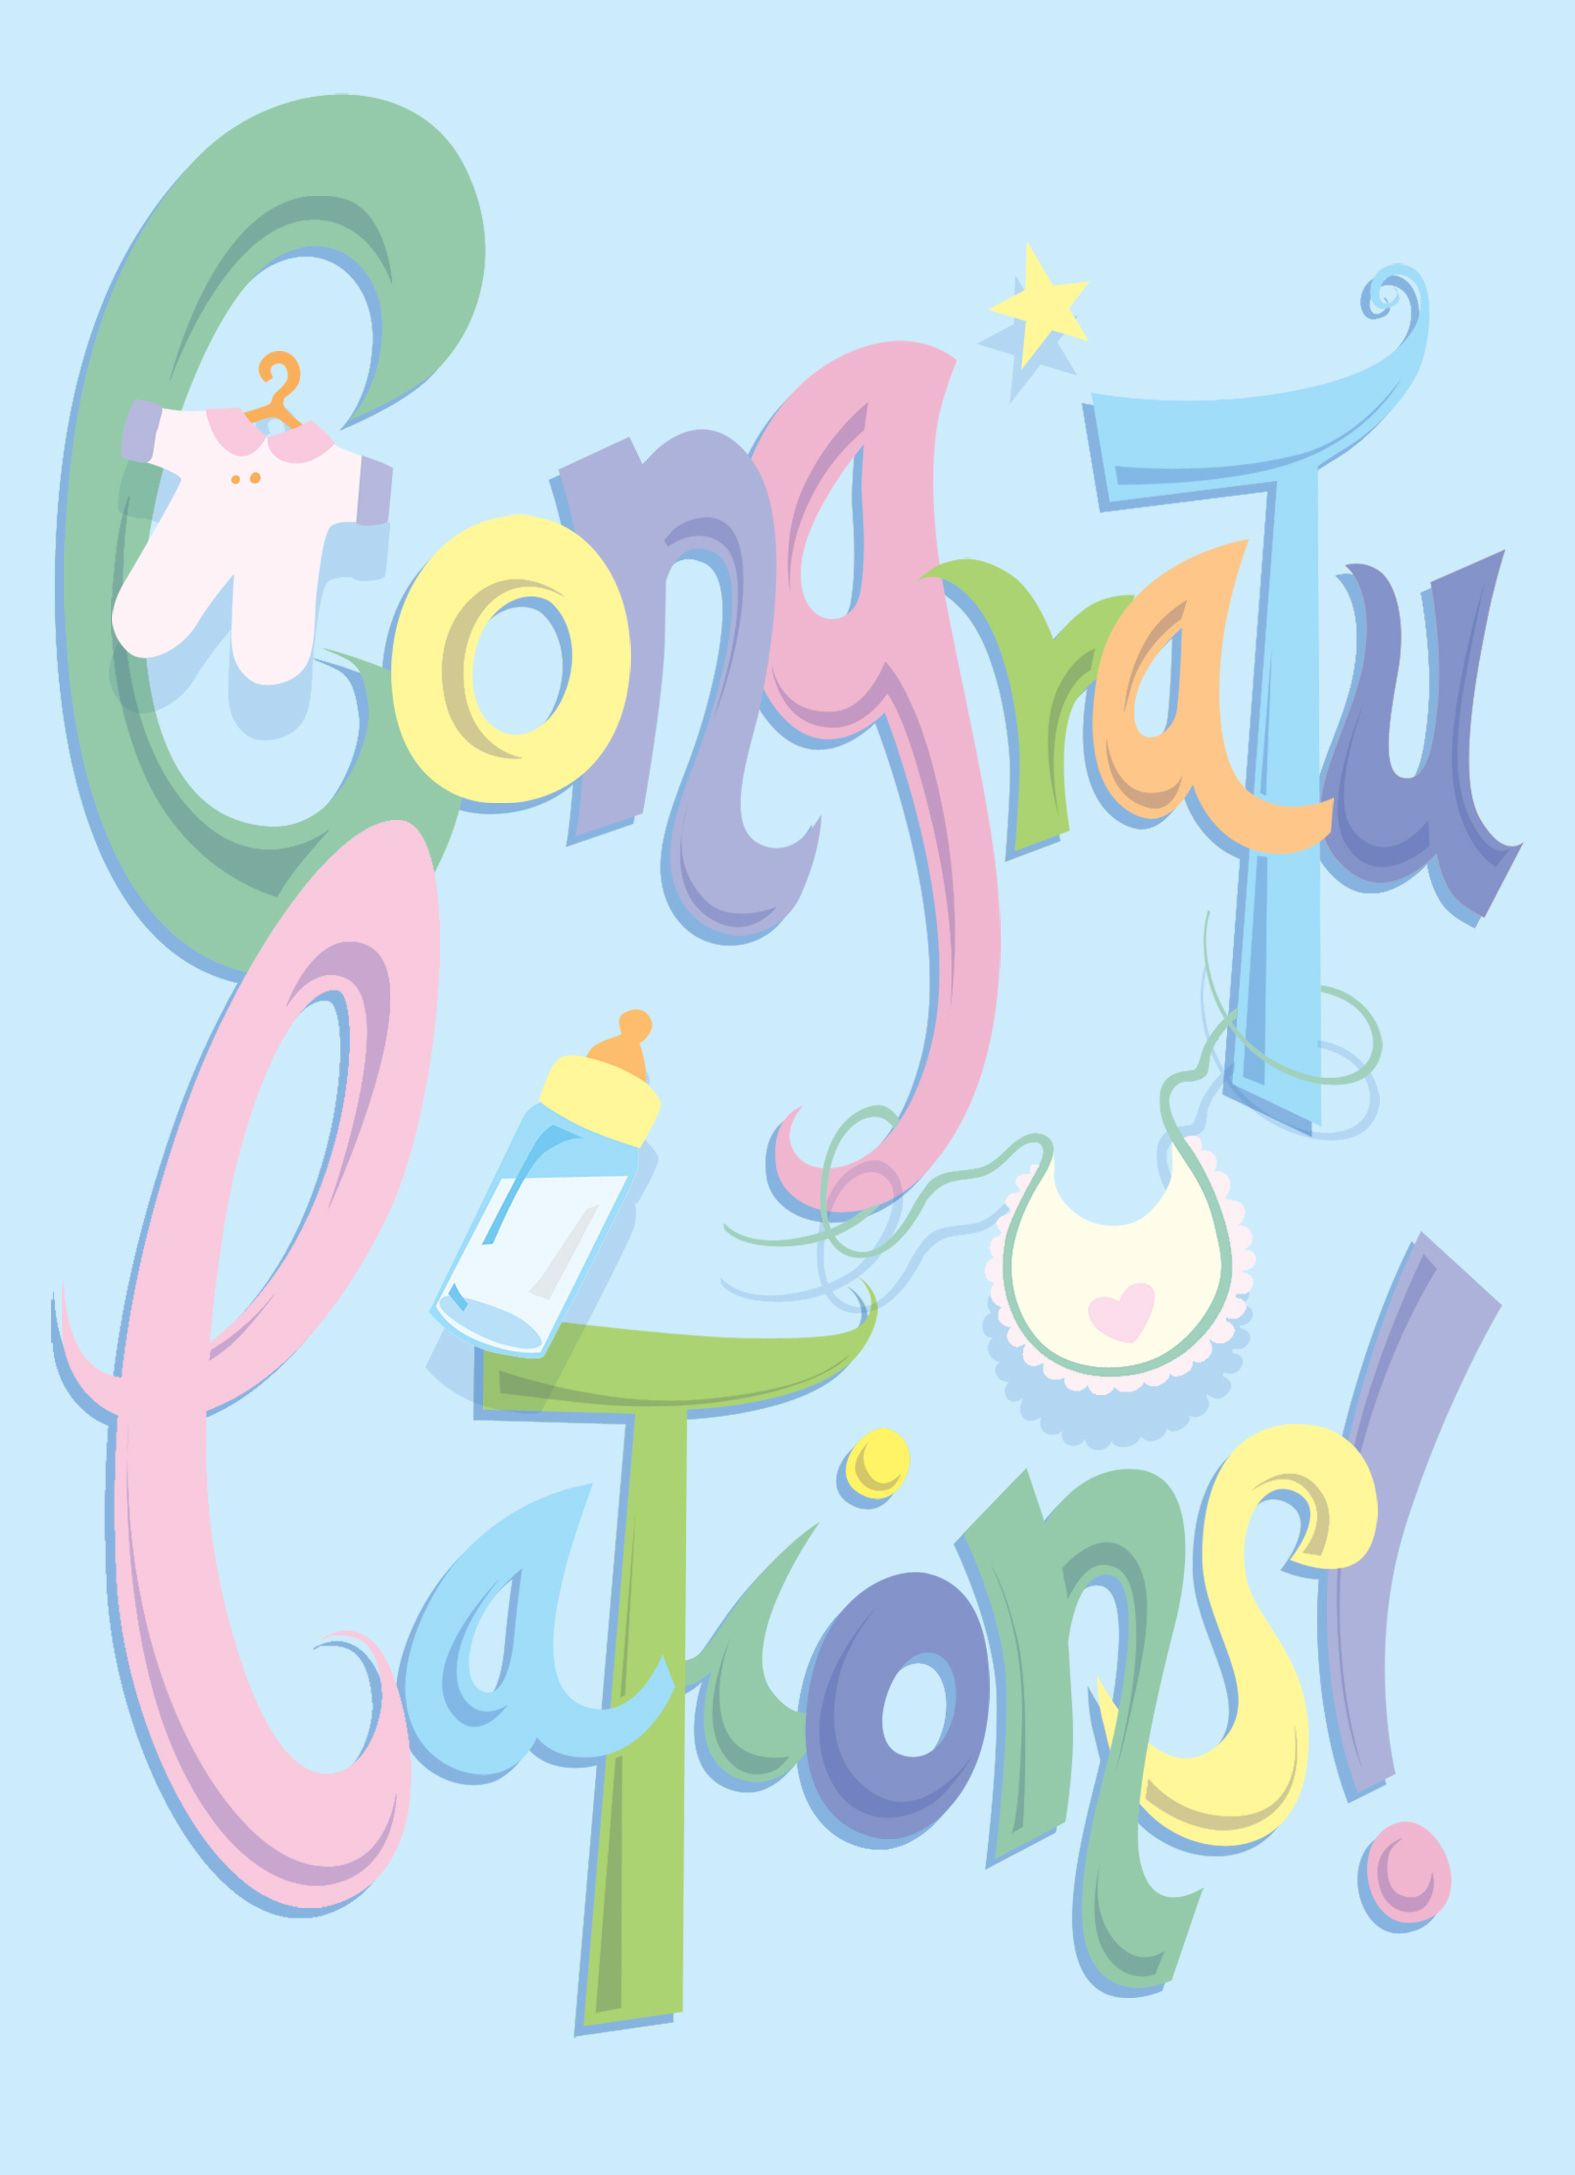 New Born Congratulations Images : congratulations, images, Congratulations, Baby., #BabyShower, #GreetingCardIdeas, Baby,, Card,, Newborn